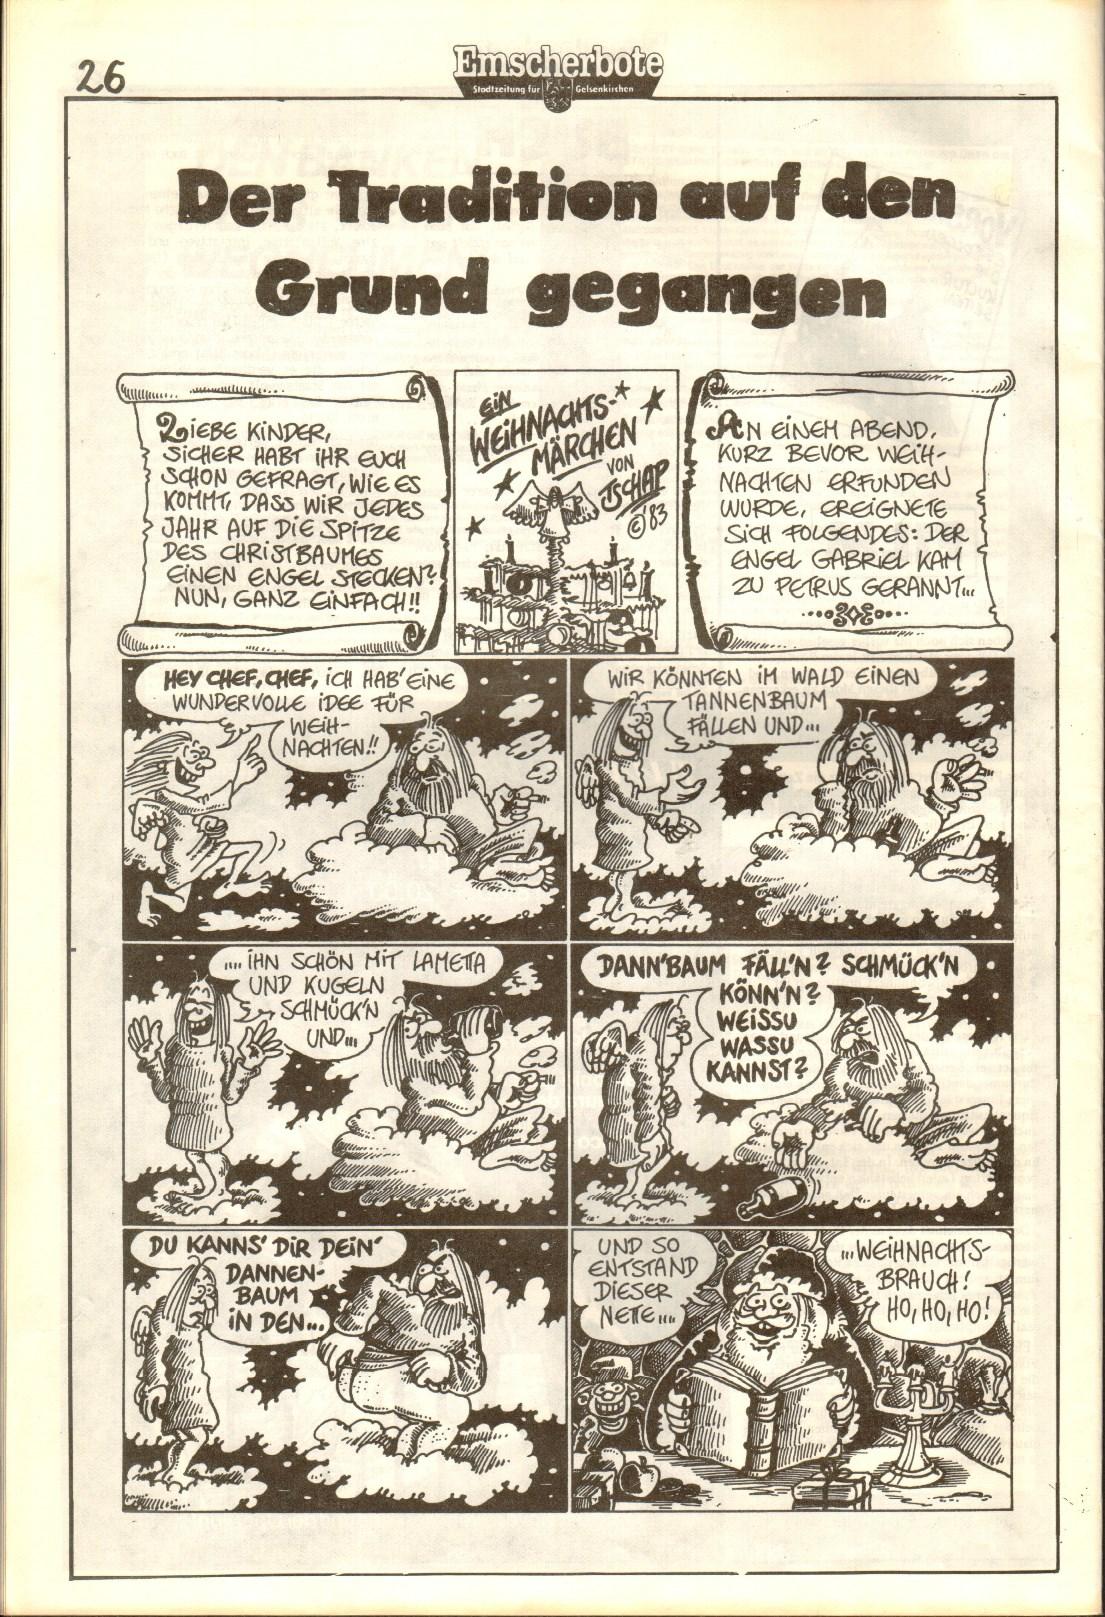 Gelsenkirchen_Emscherbote_1983_34_26